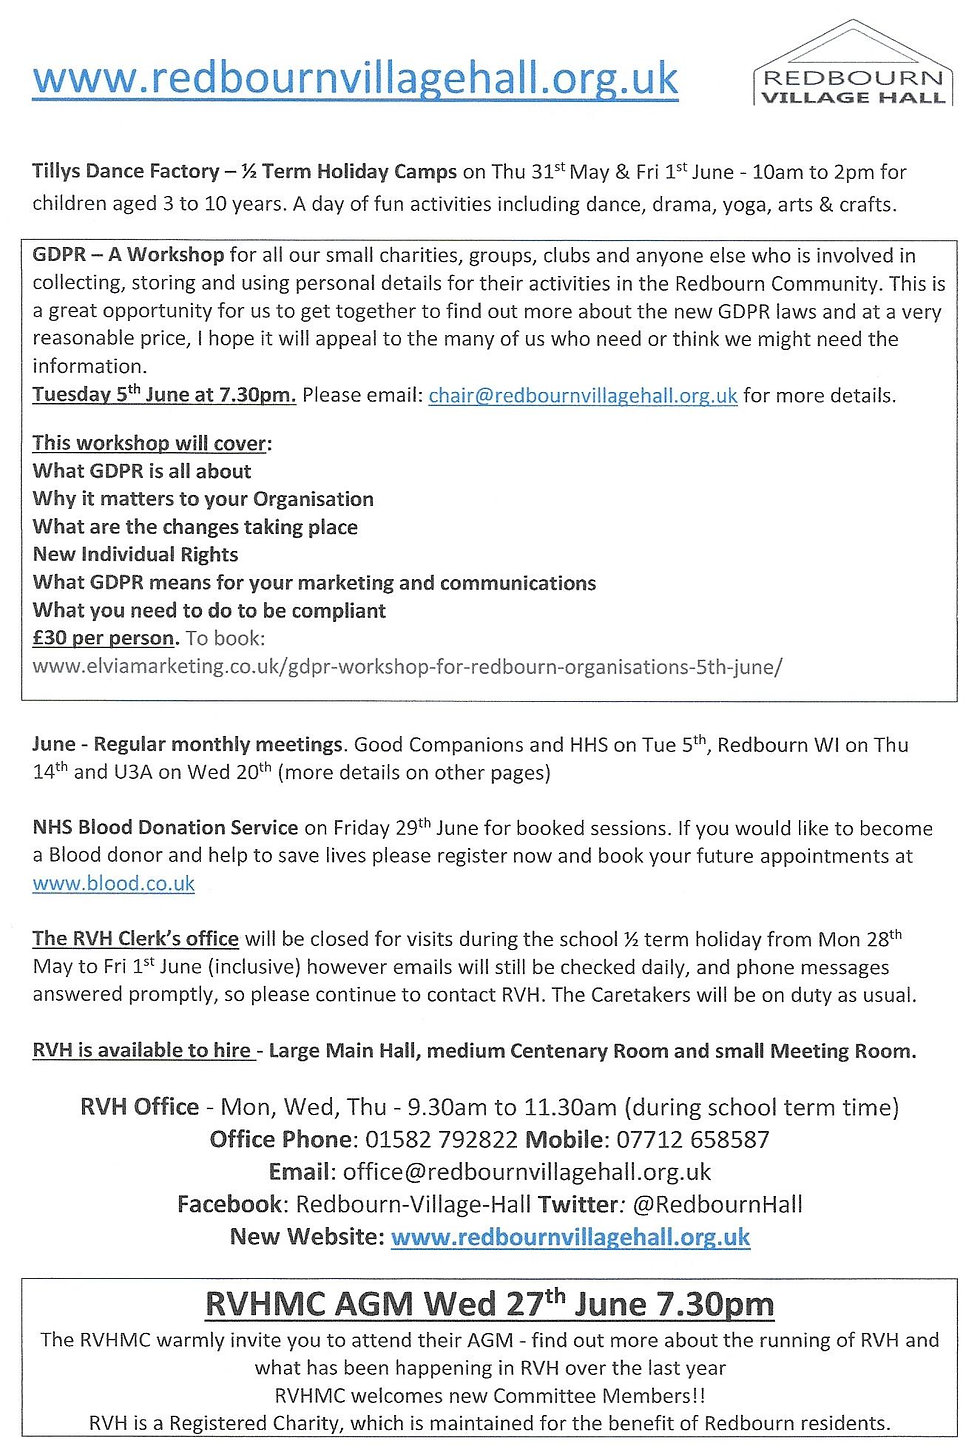 RedbournVillage Hall Events June 2018